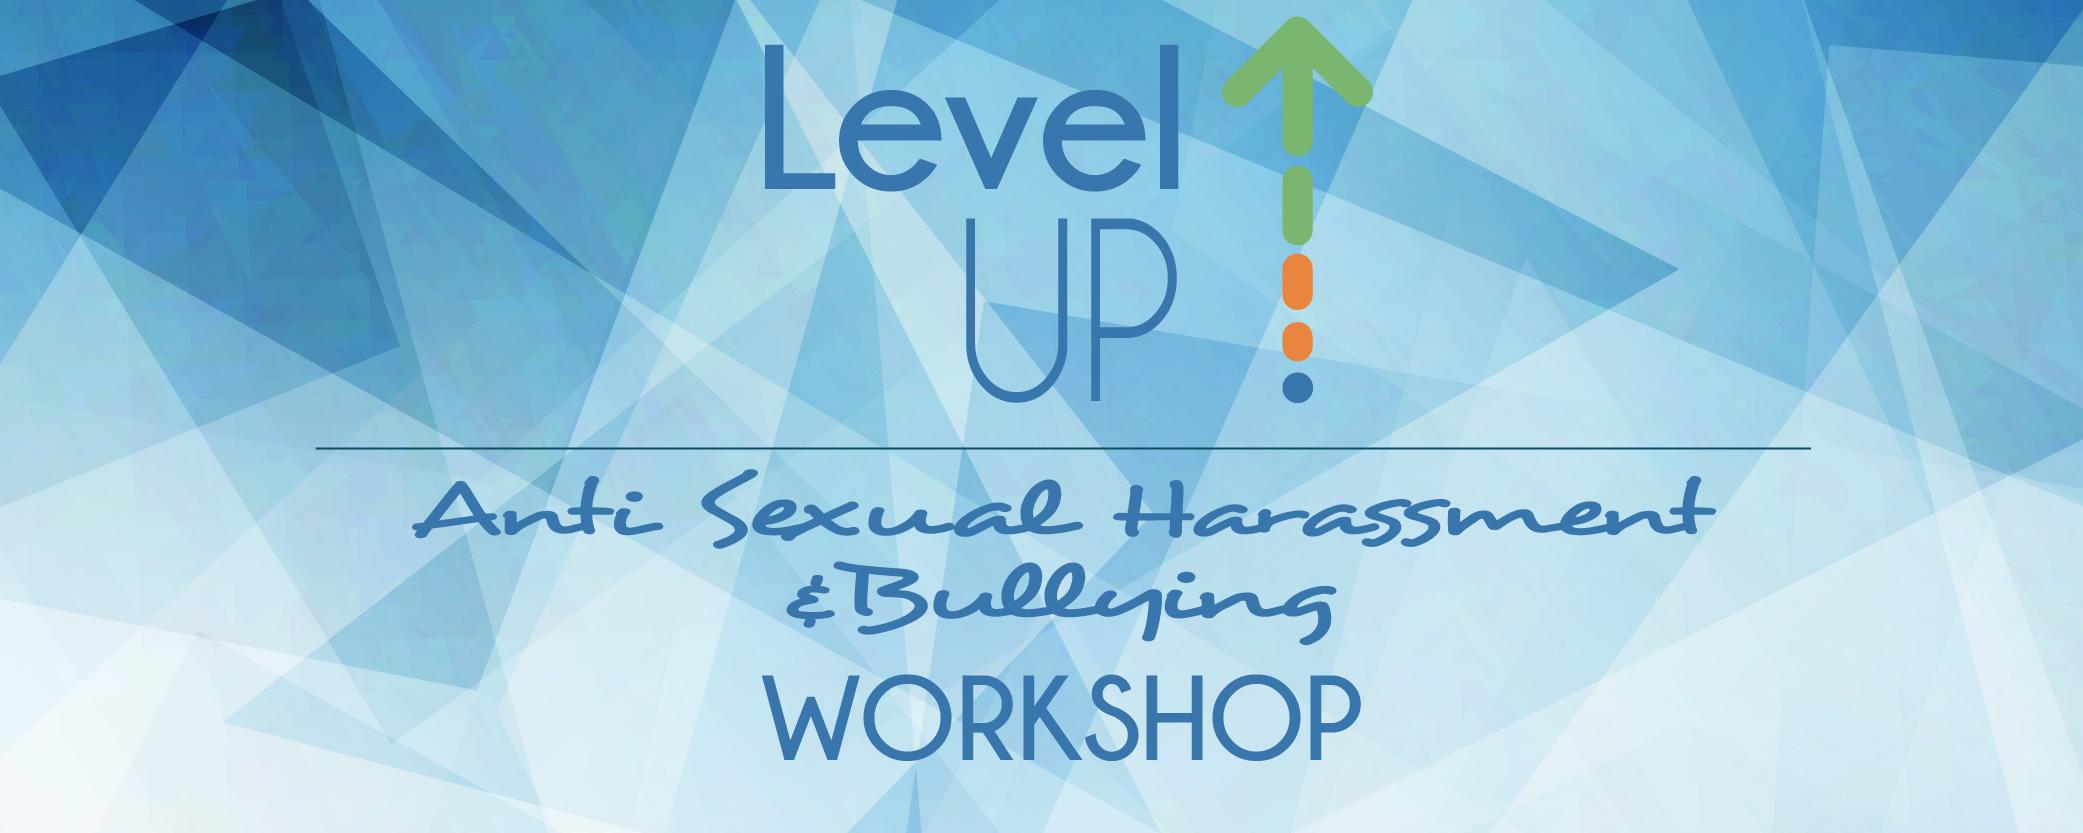 LevelUP_SexualHarassment_Website-01.jpg